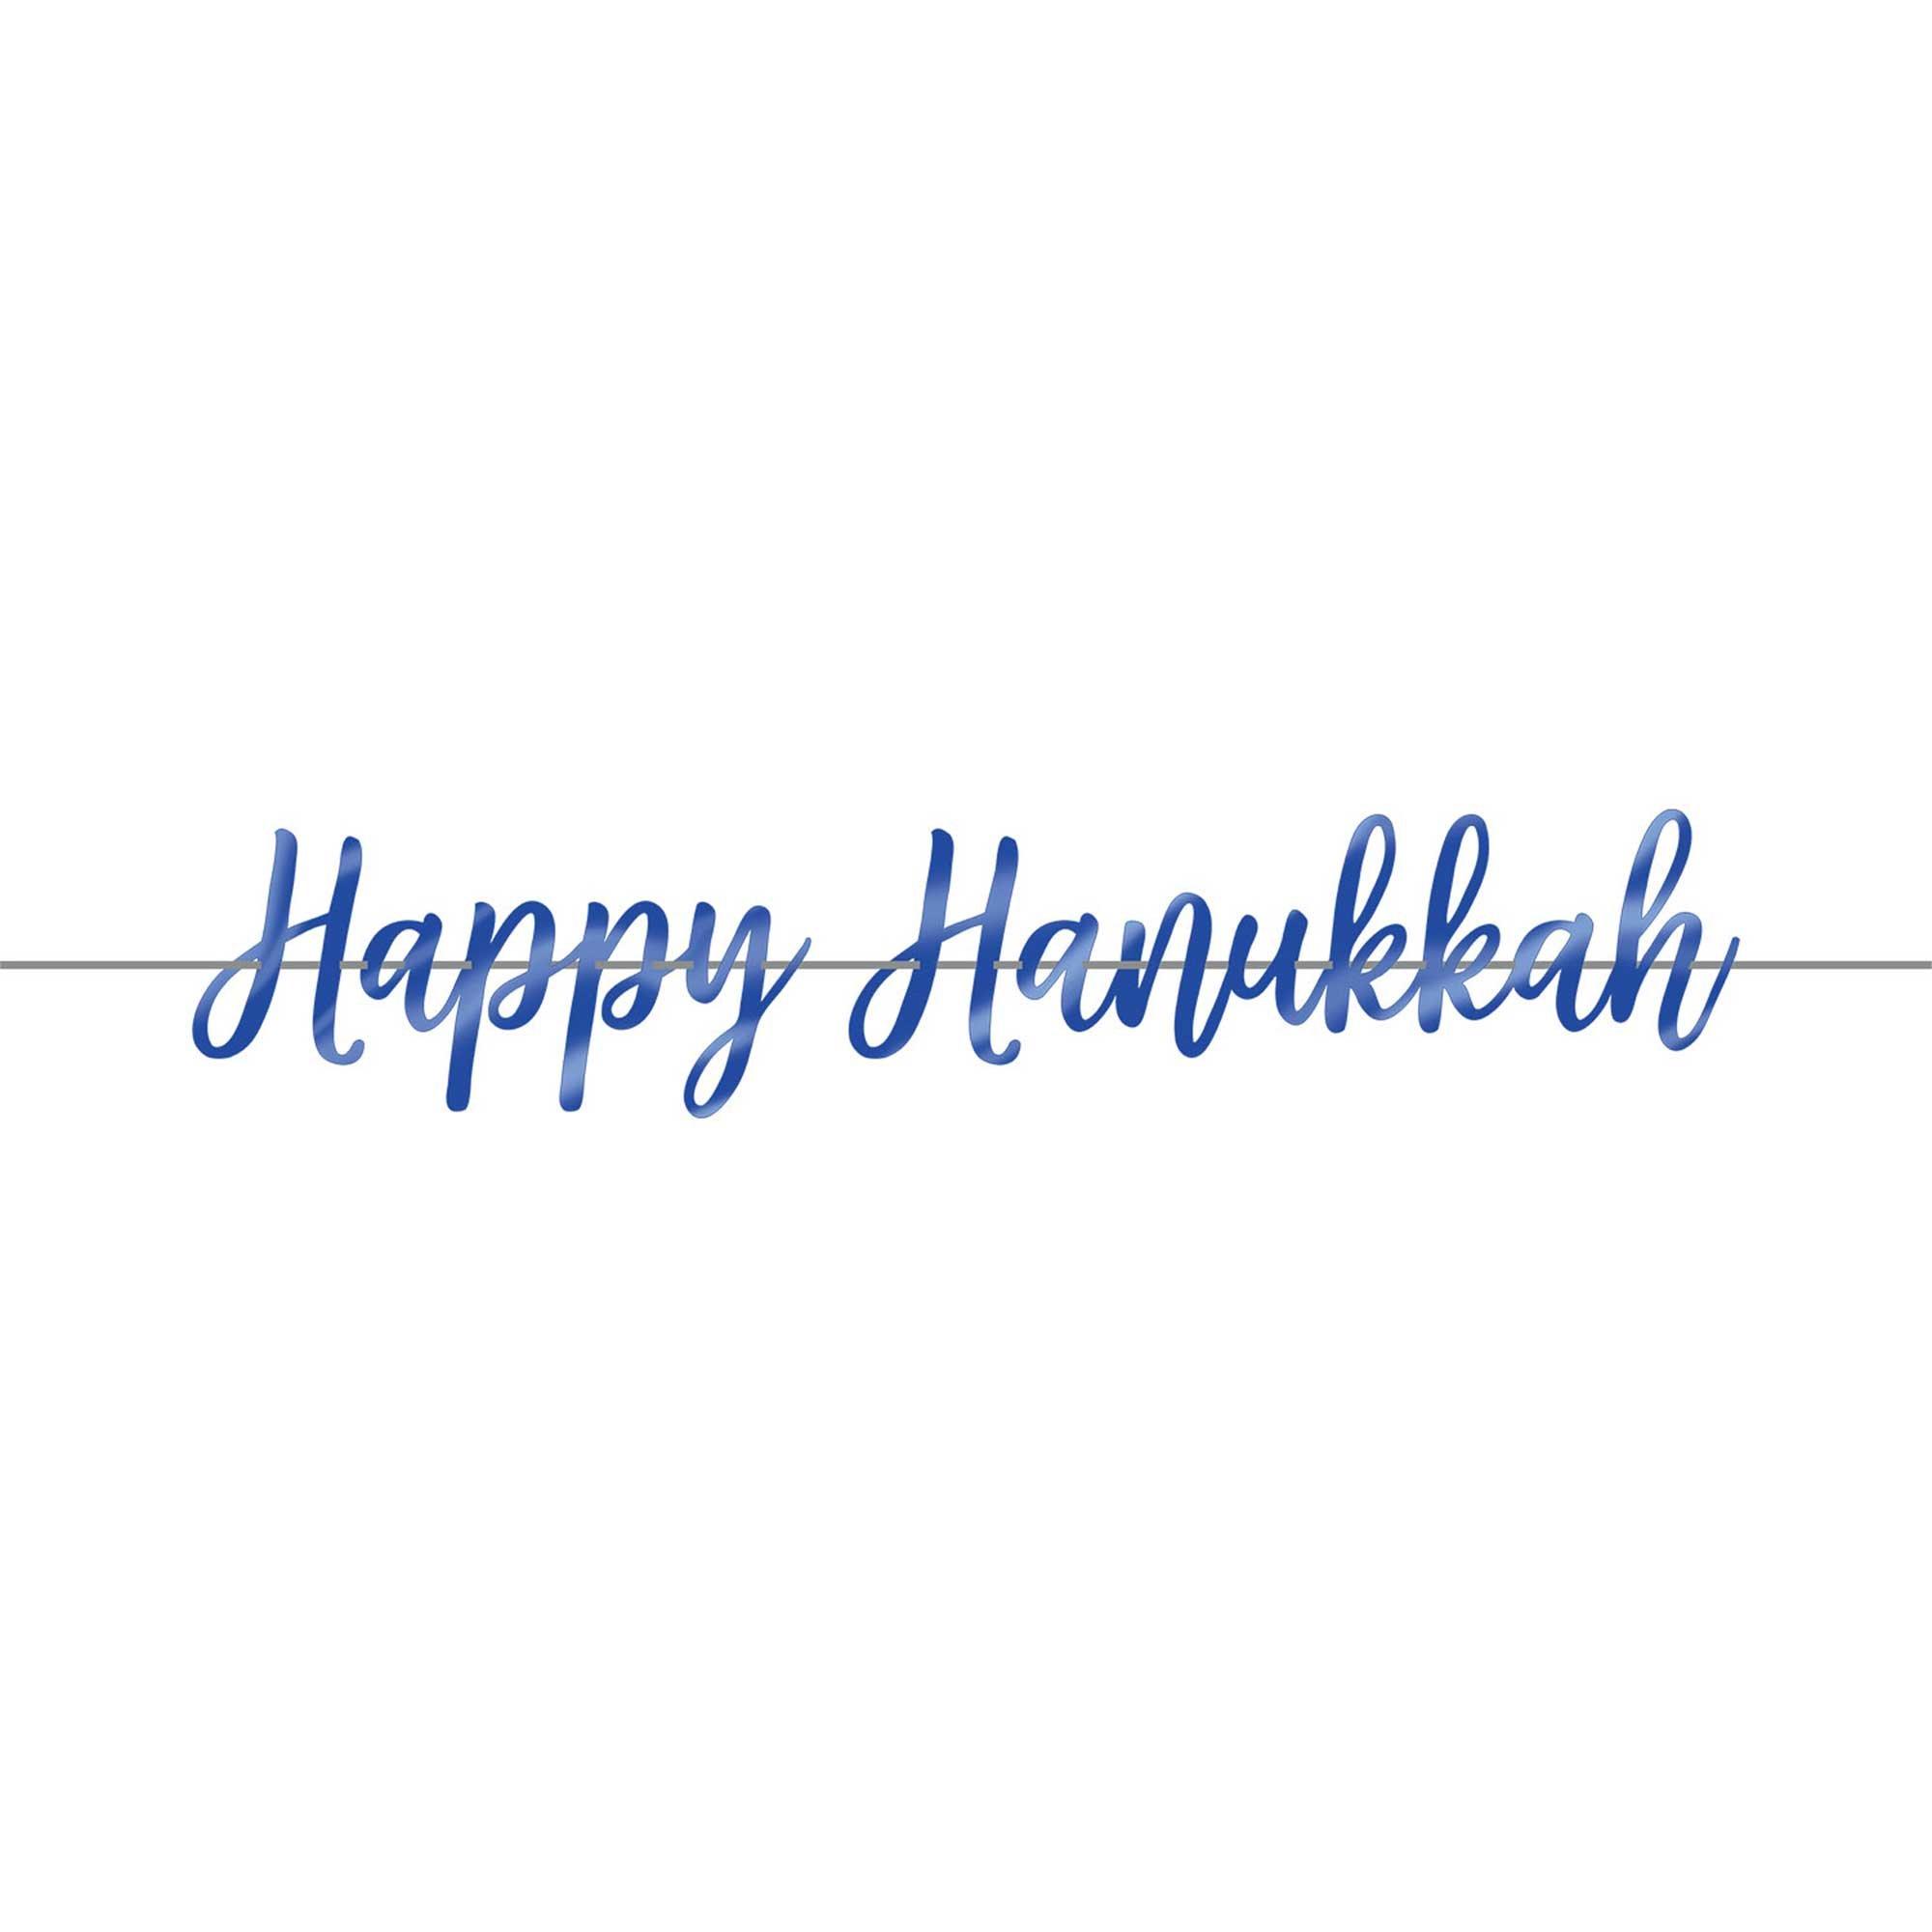 Happy Hanukkah Foil Script Ribbon Banner